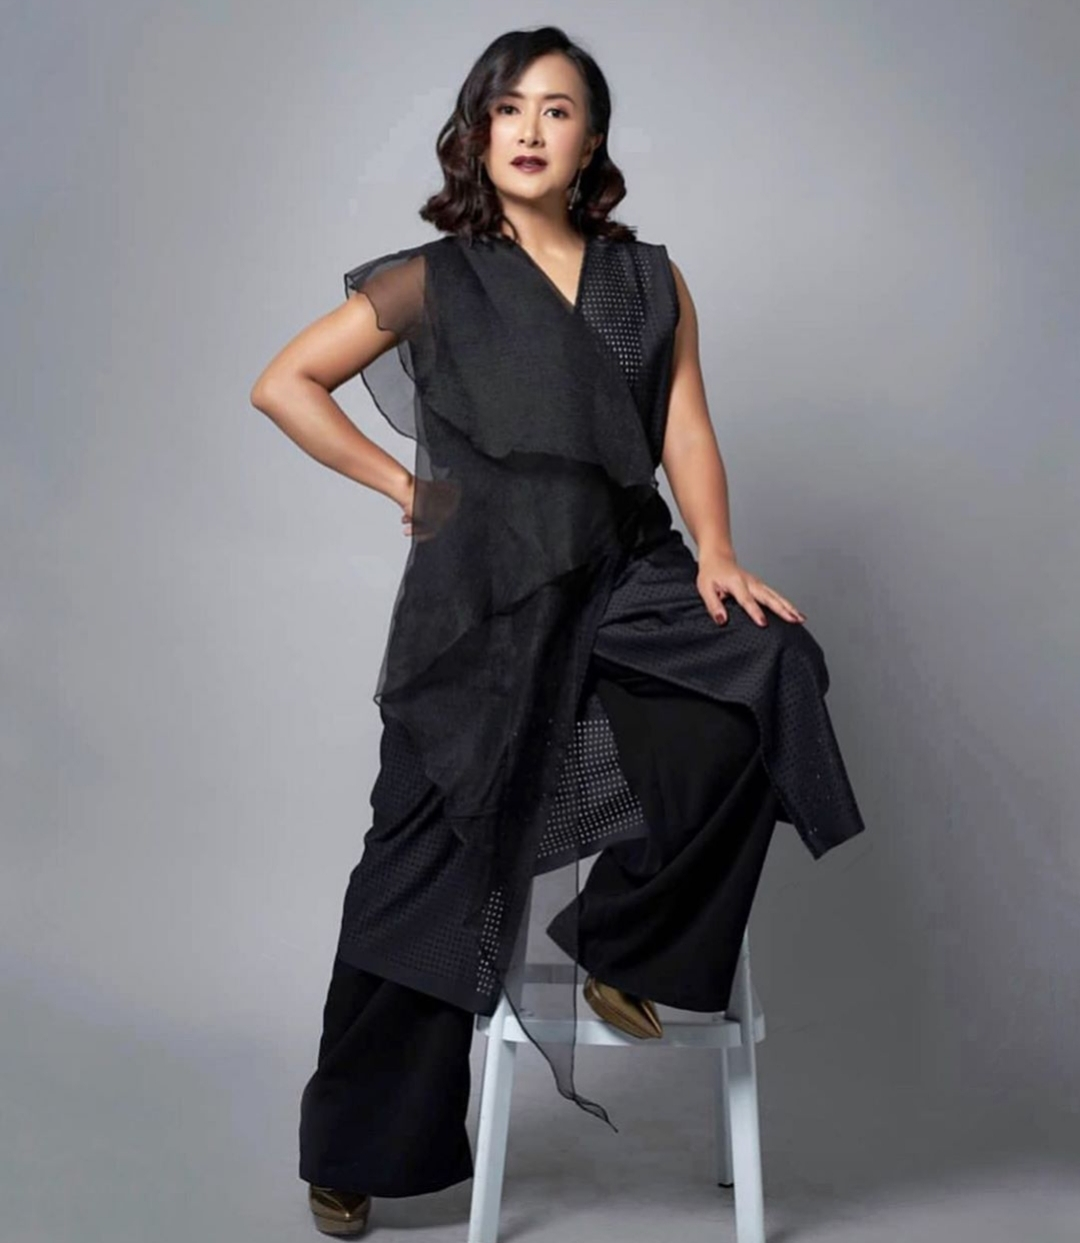 Garment bali, Bali clothing , Clothing factory bali , Garment factory bali, sovana, sovana bali, Bali garment manufacture, clothing manufacturers bali, bali garment